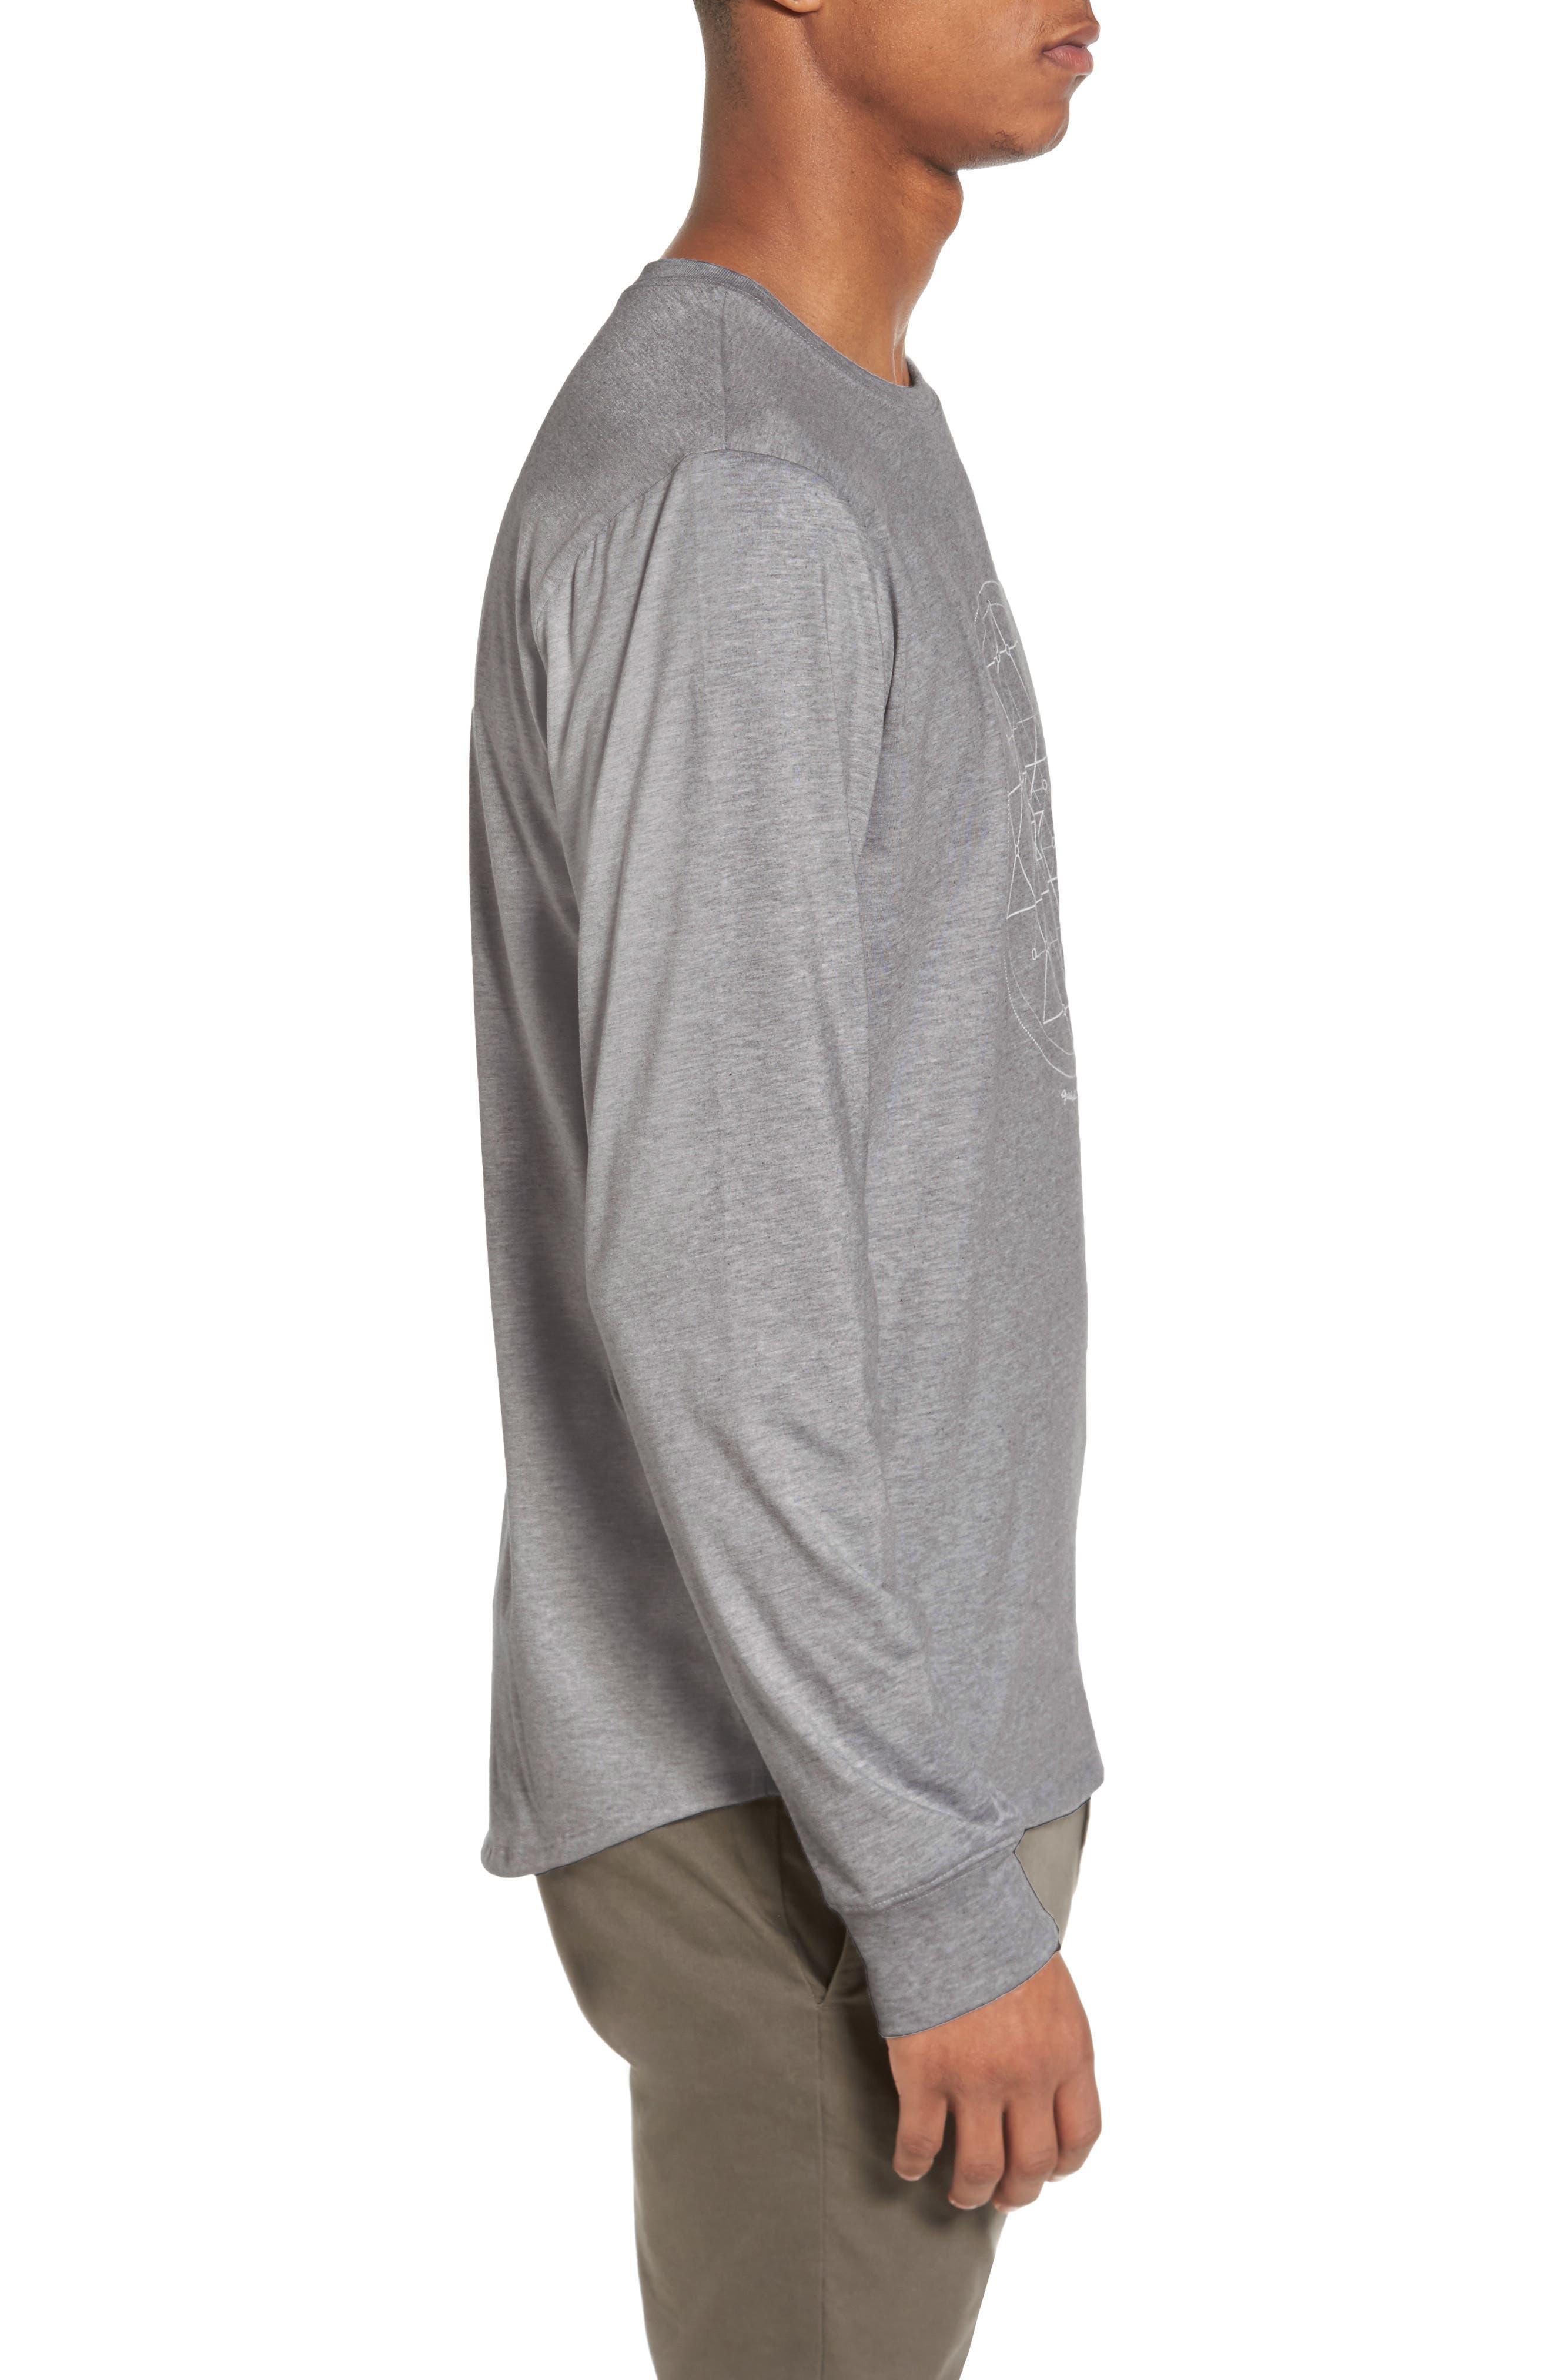 Yantra Long Sleeve T-Shirt,                             Alternate thumbnail 7, color,                             Heather Grey/ Heather Grey